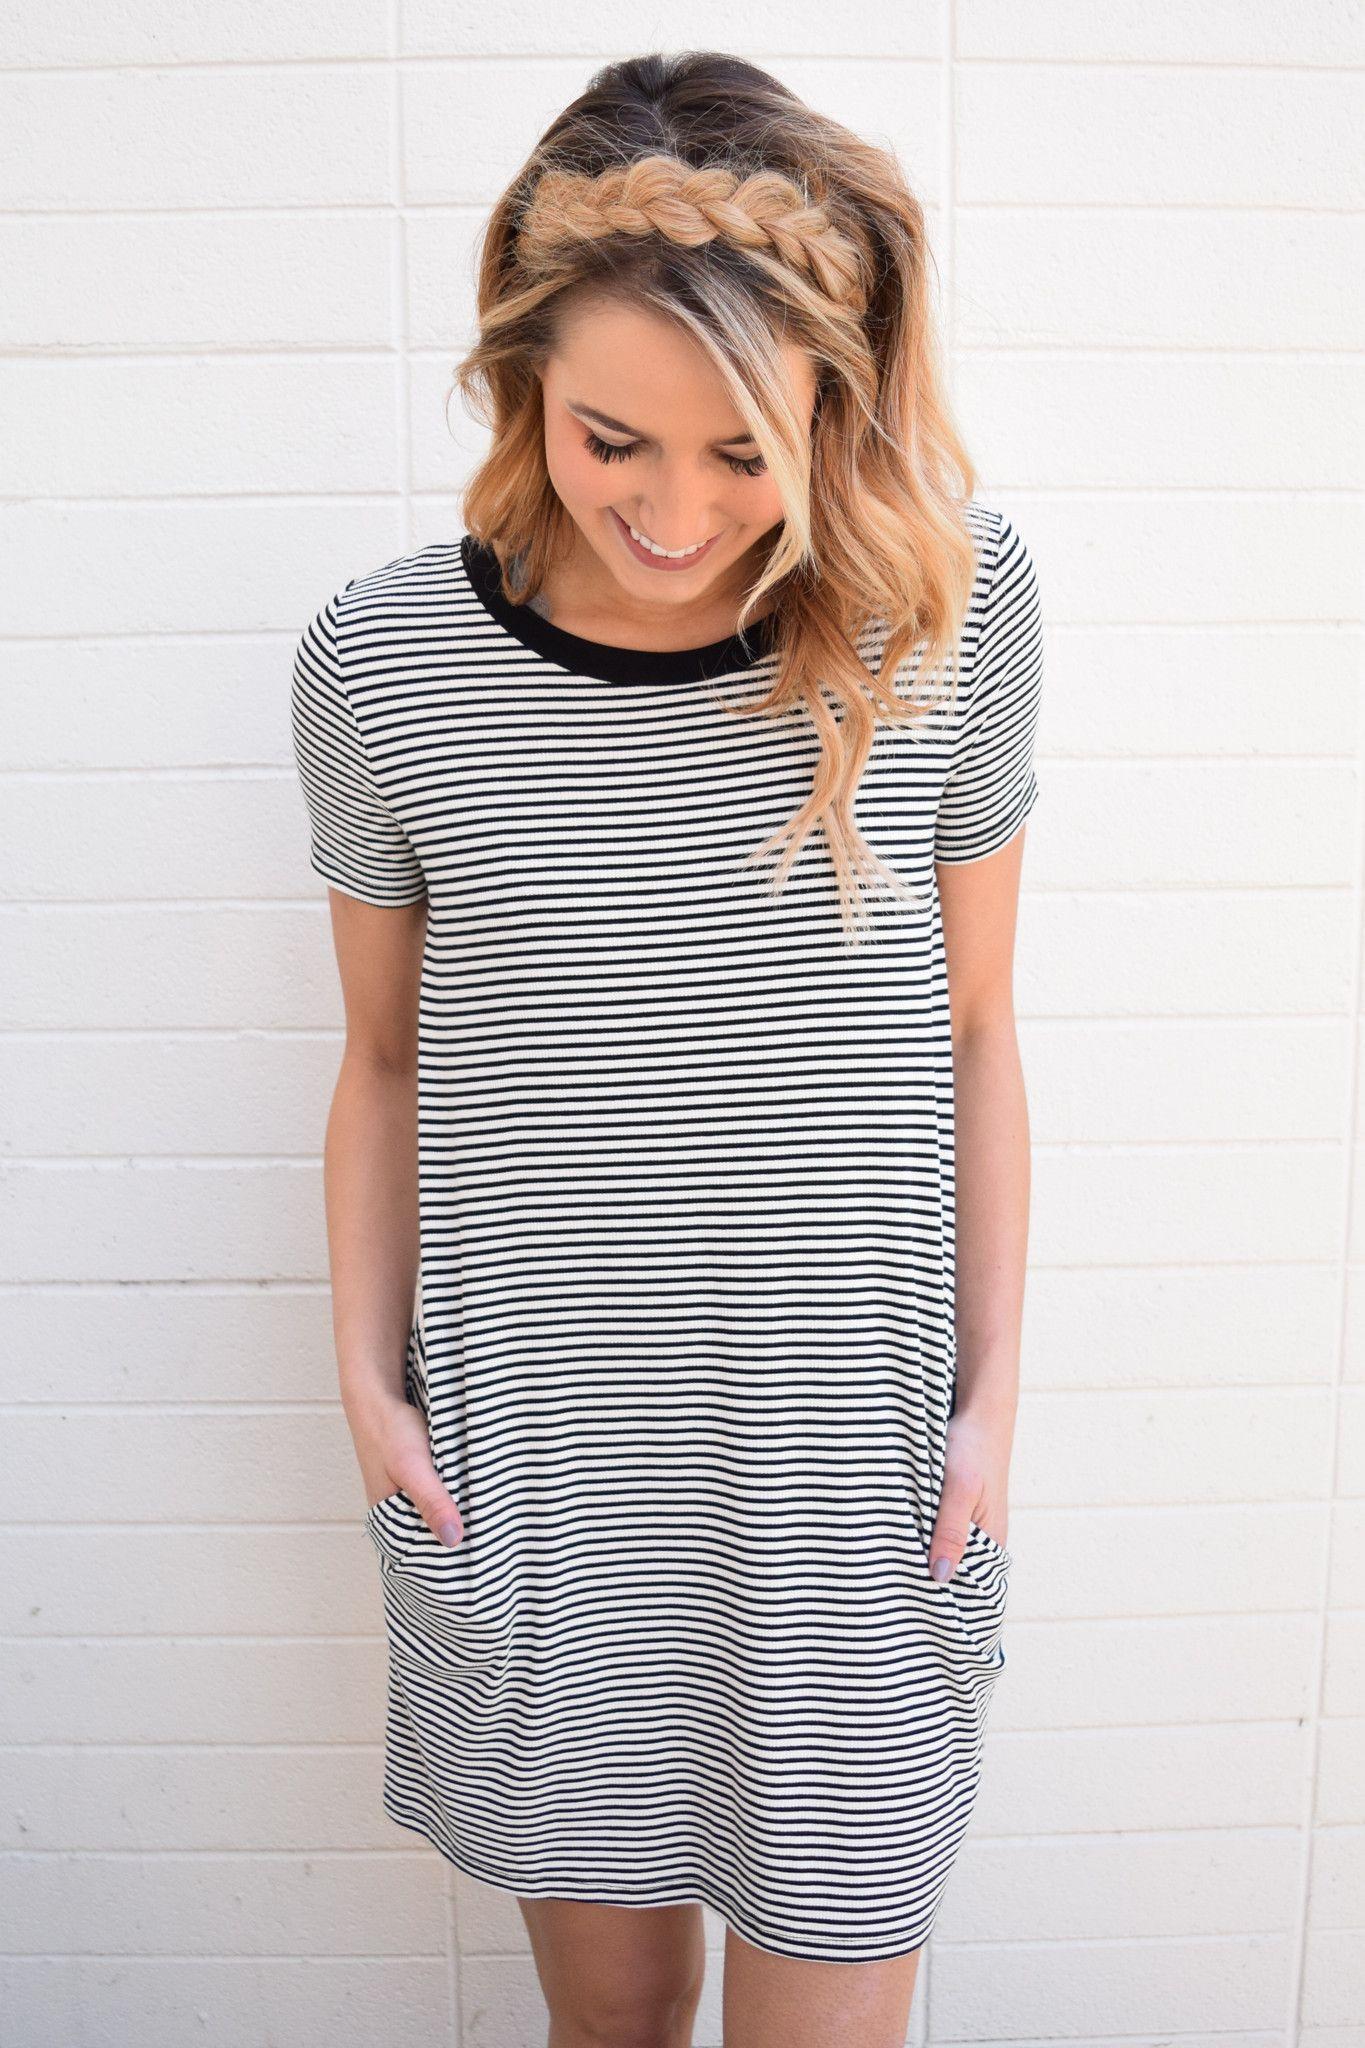 Simply Striped Tee Shirt Dress Striped Tee Shirt Dress Tee Shirt Dress Shirt Dress [ 2048 x 1365 Pixel ]